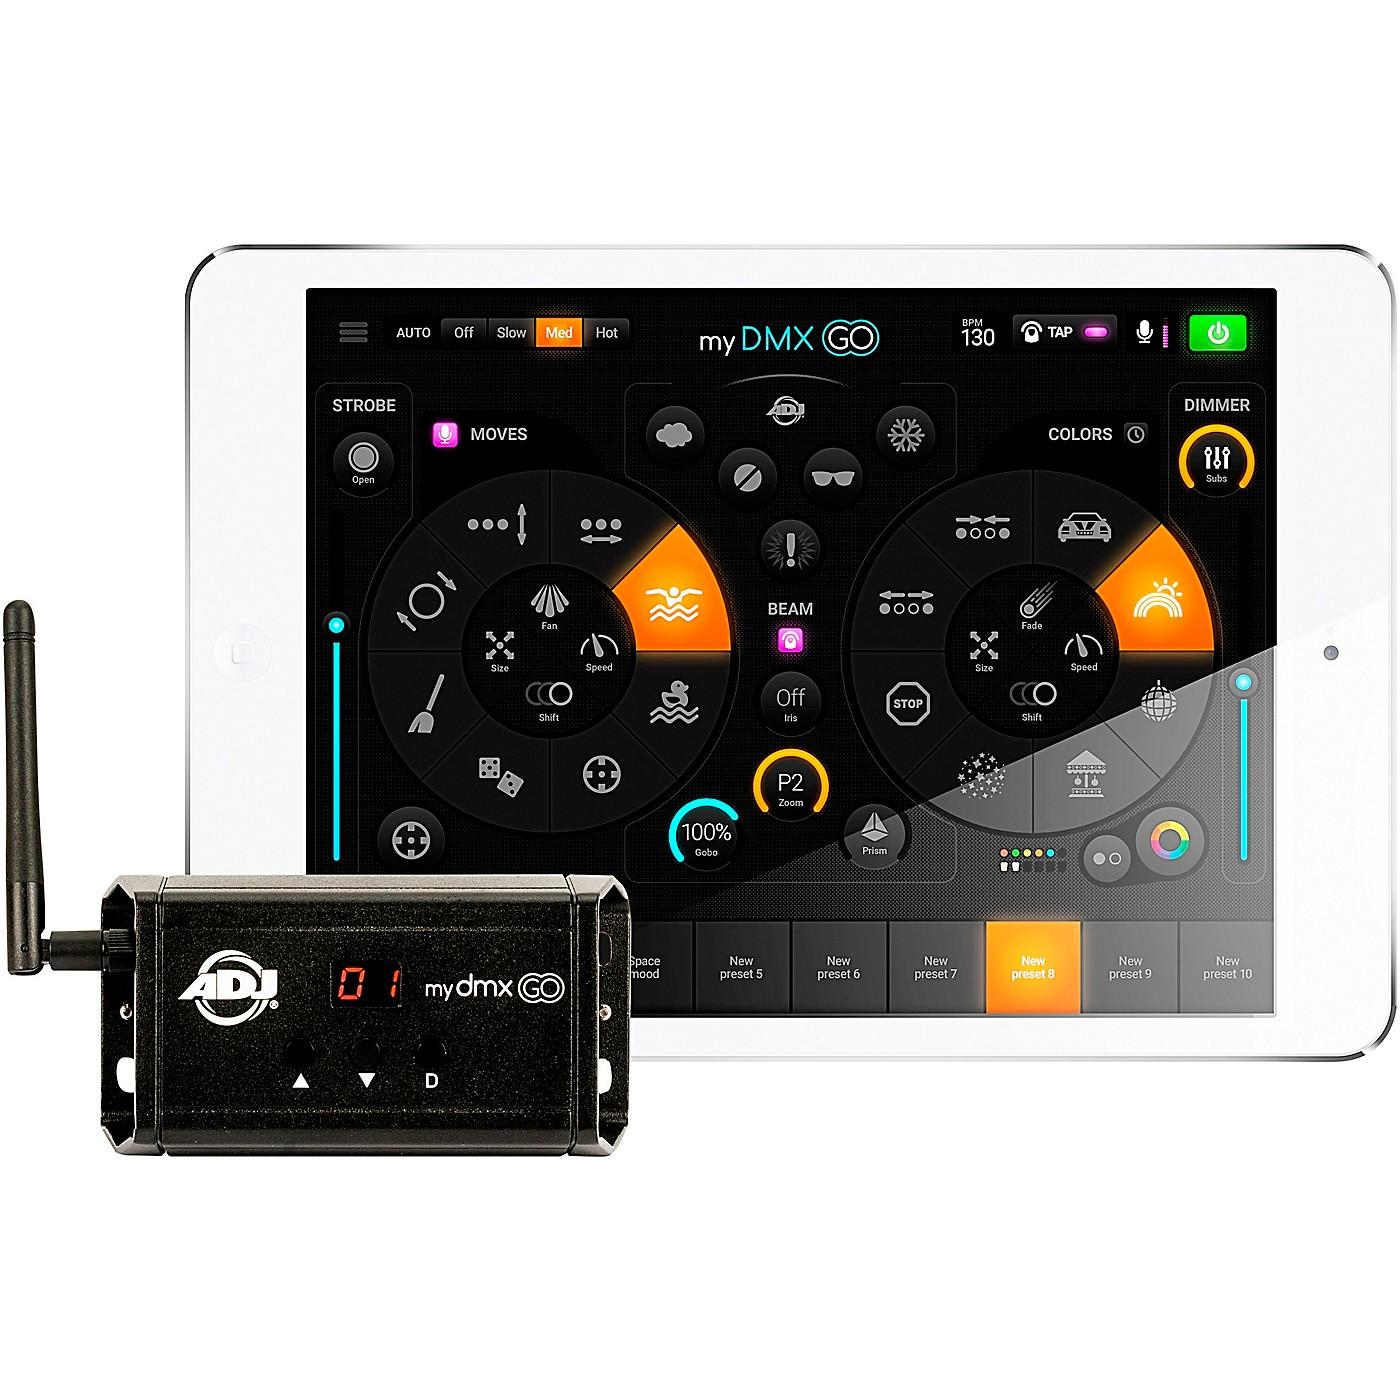 American DJ mydmx GO DMX Lighting Control System thumbnail